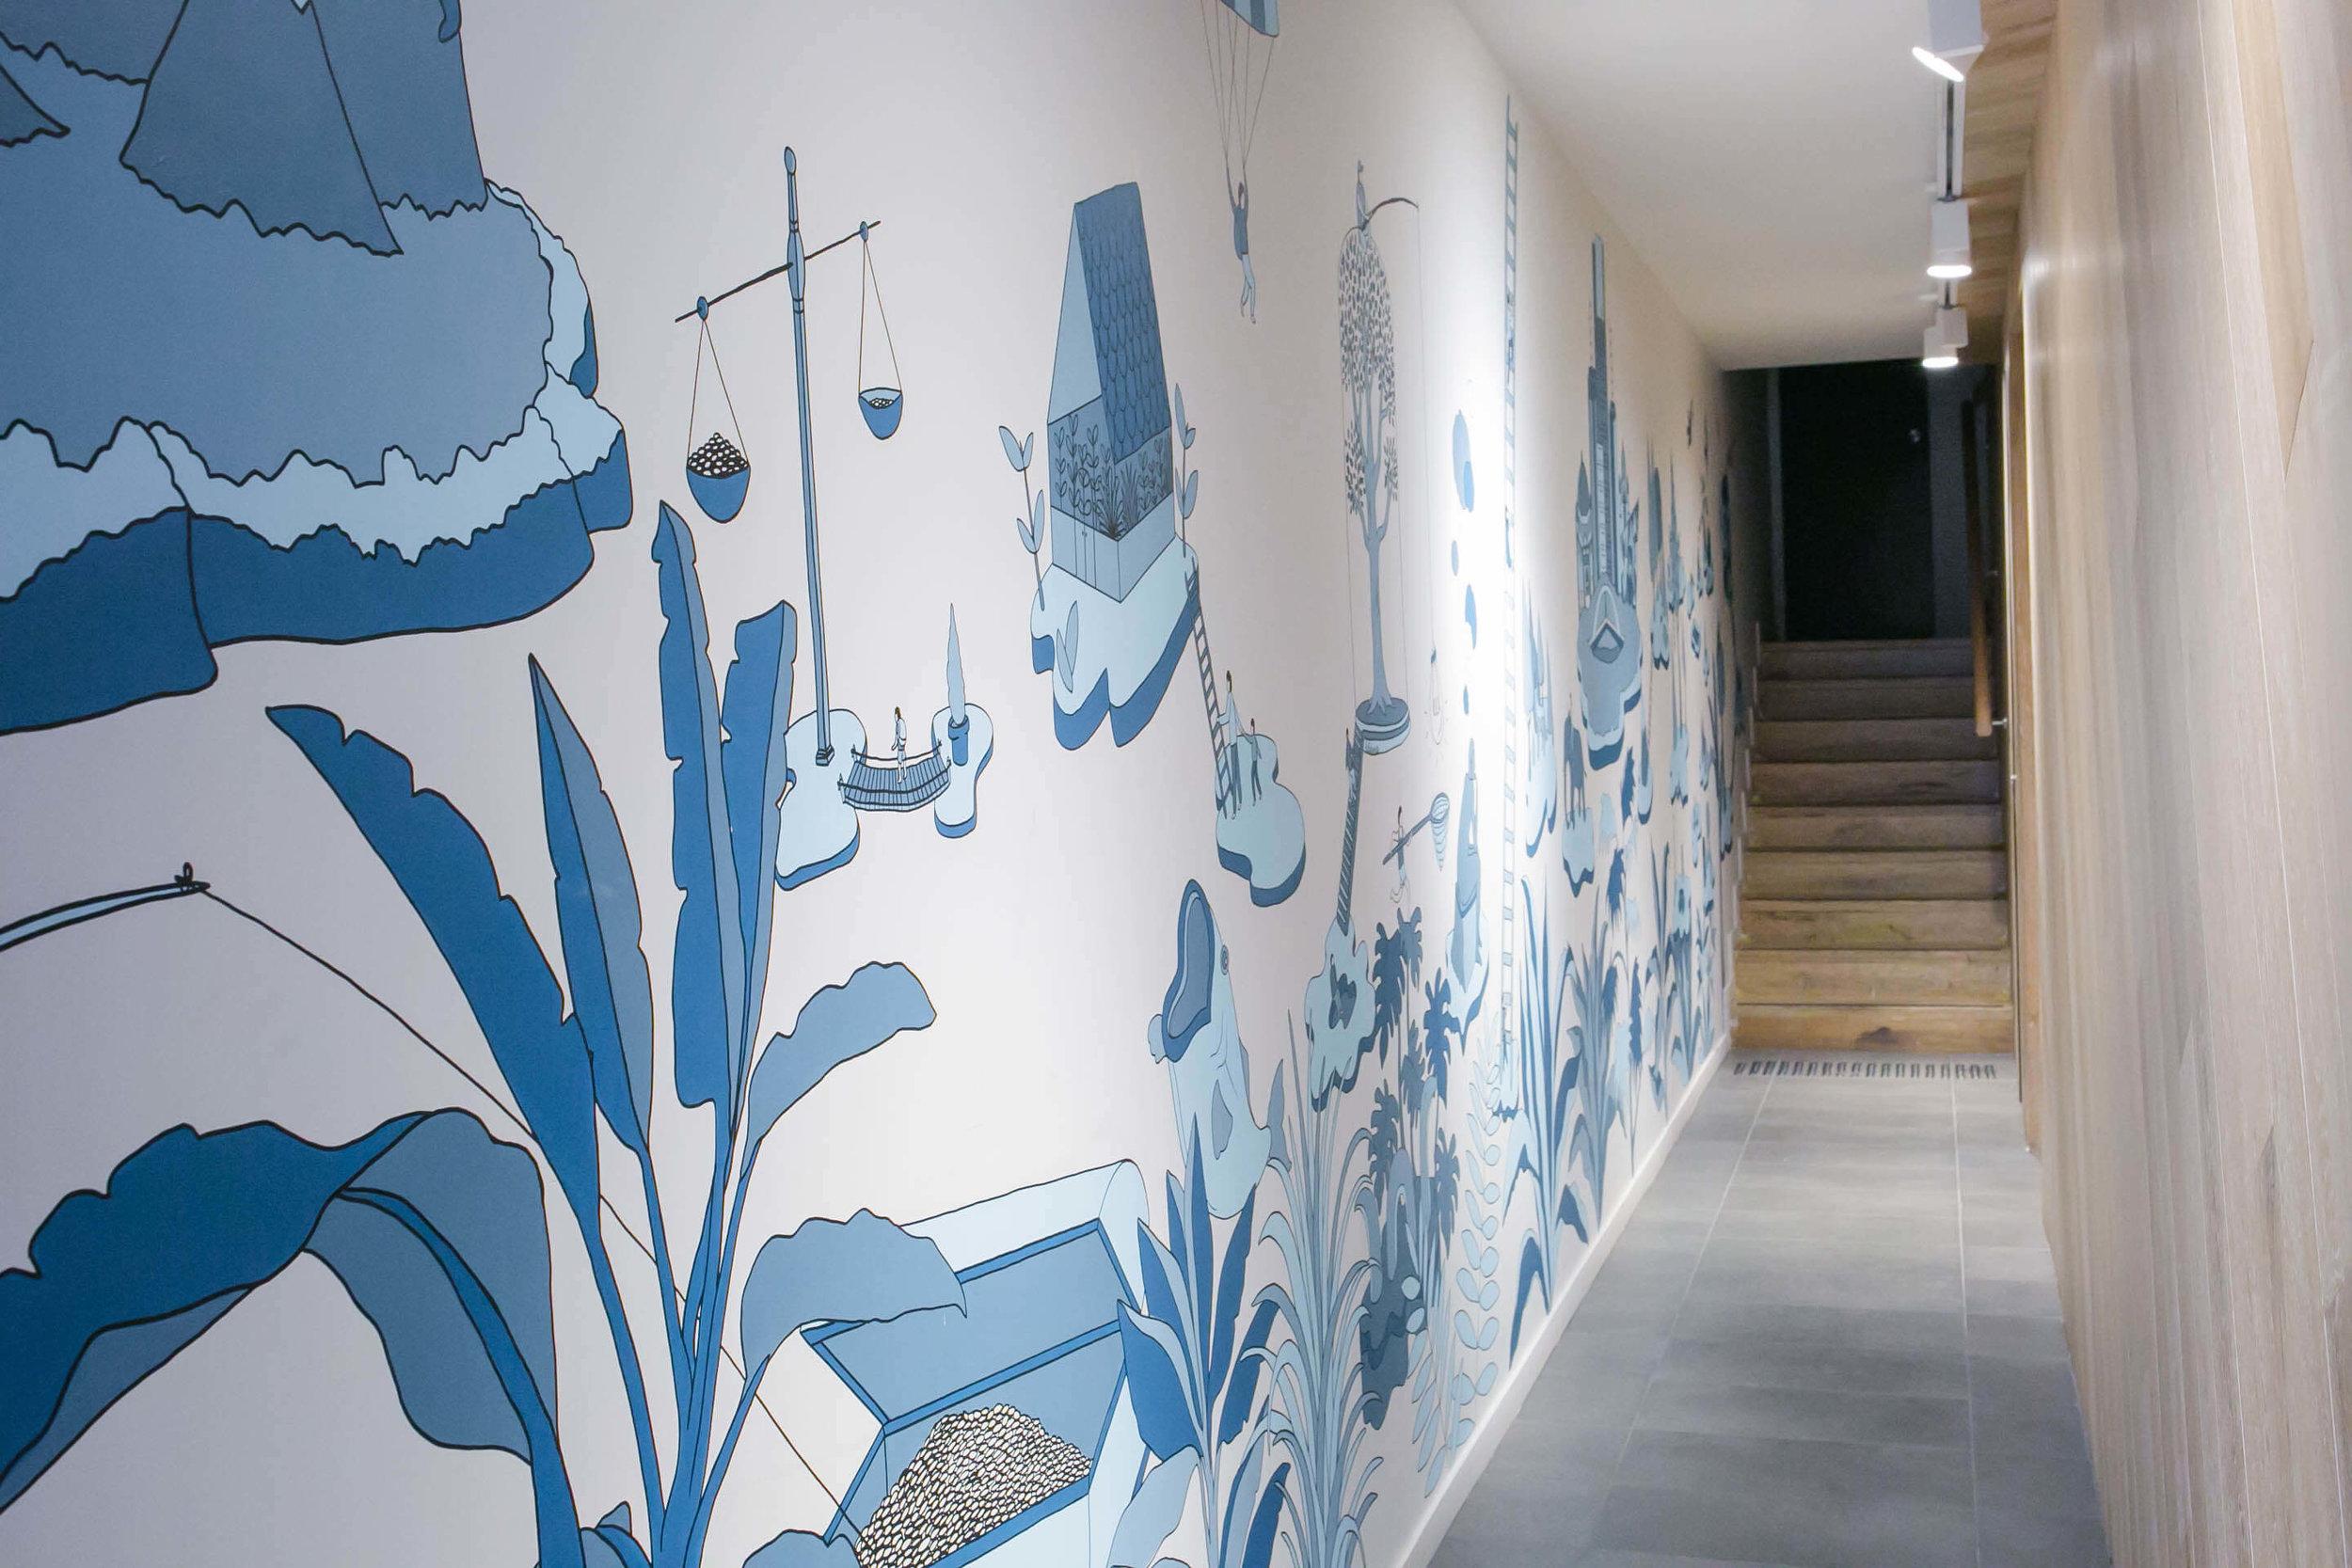 Kalitek Constructions / easey street co-working space mural, Collingwood